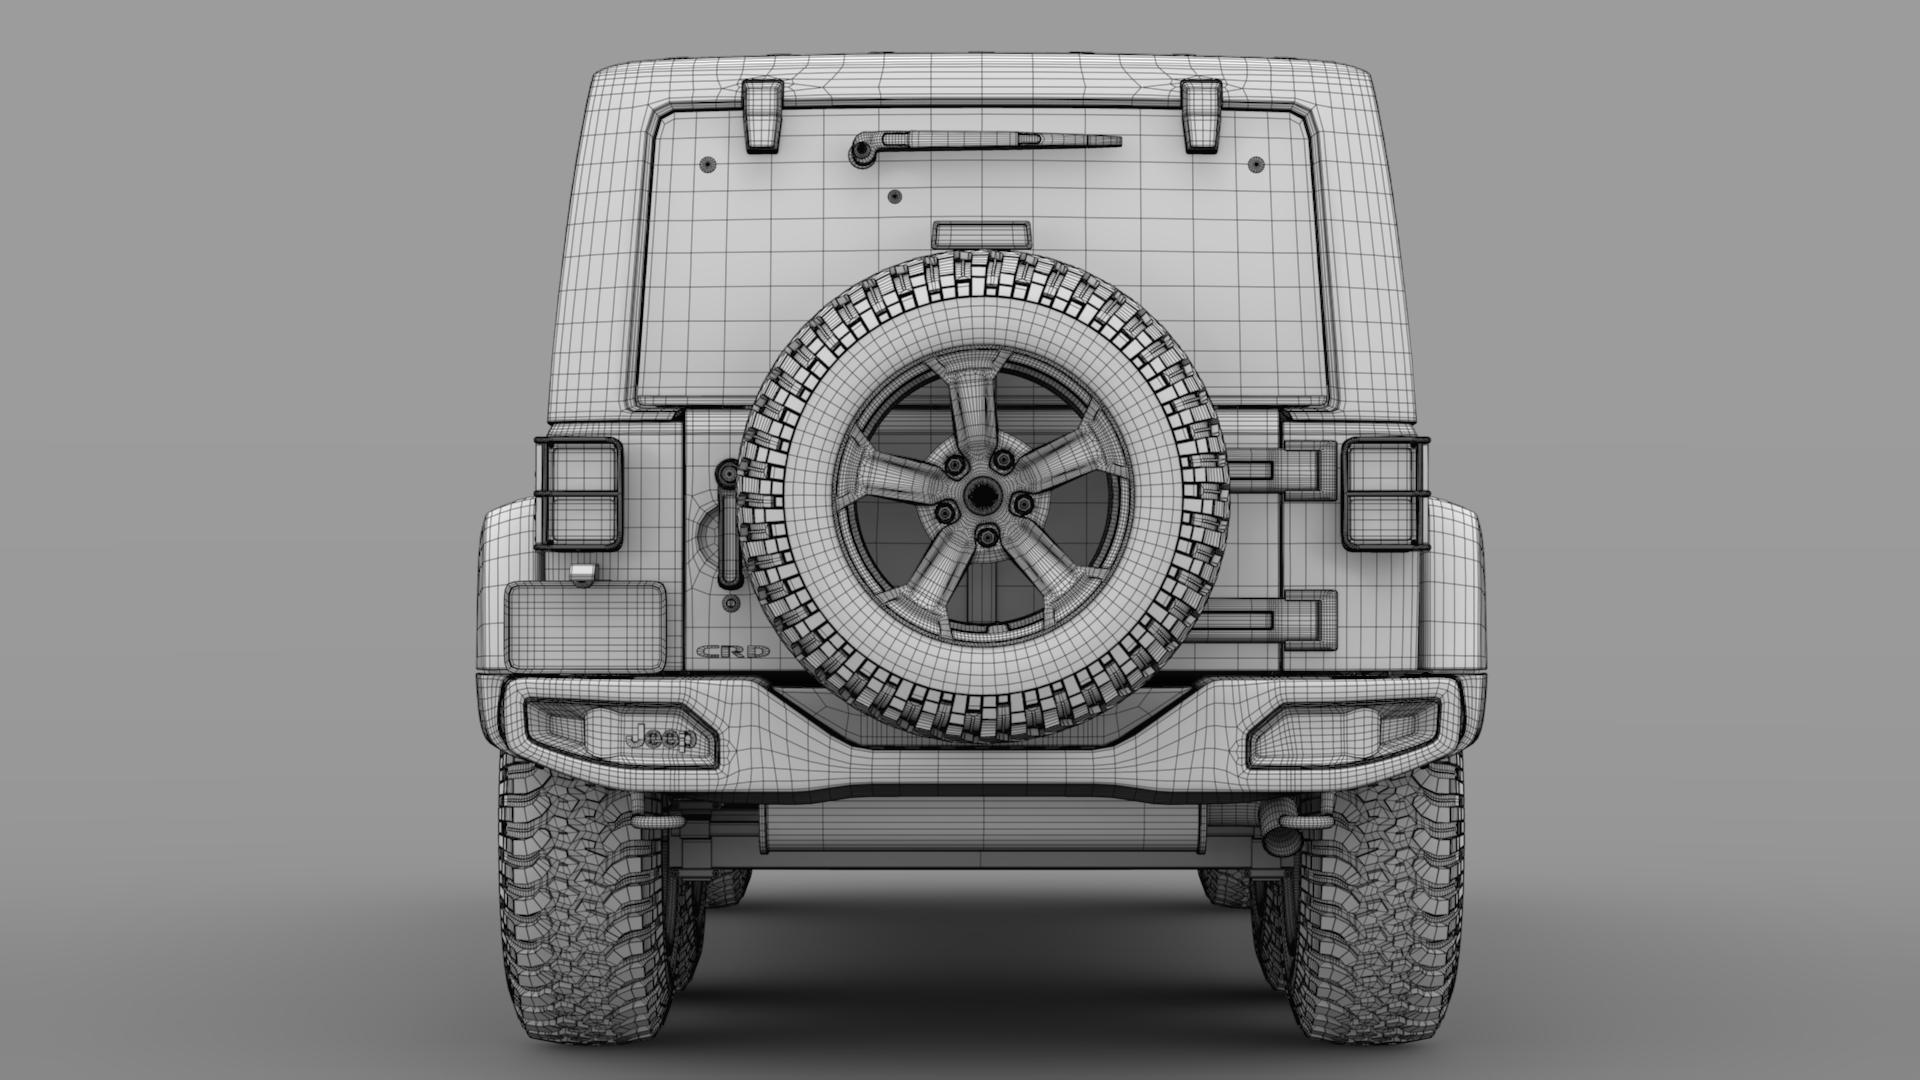 jeep wrangler 6×6 rubicon recon jk 2017 3d model max fbx c4d lwo ma mb hrc xsi obj 276854